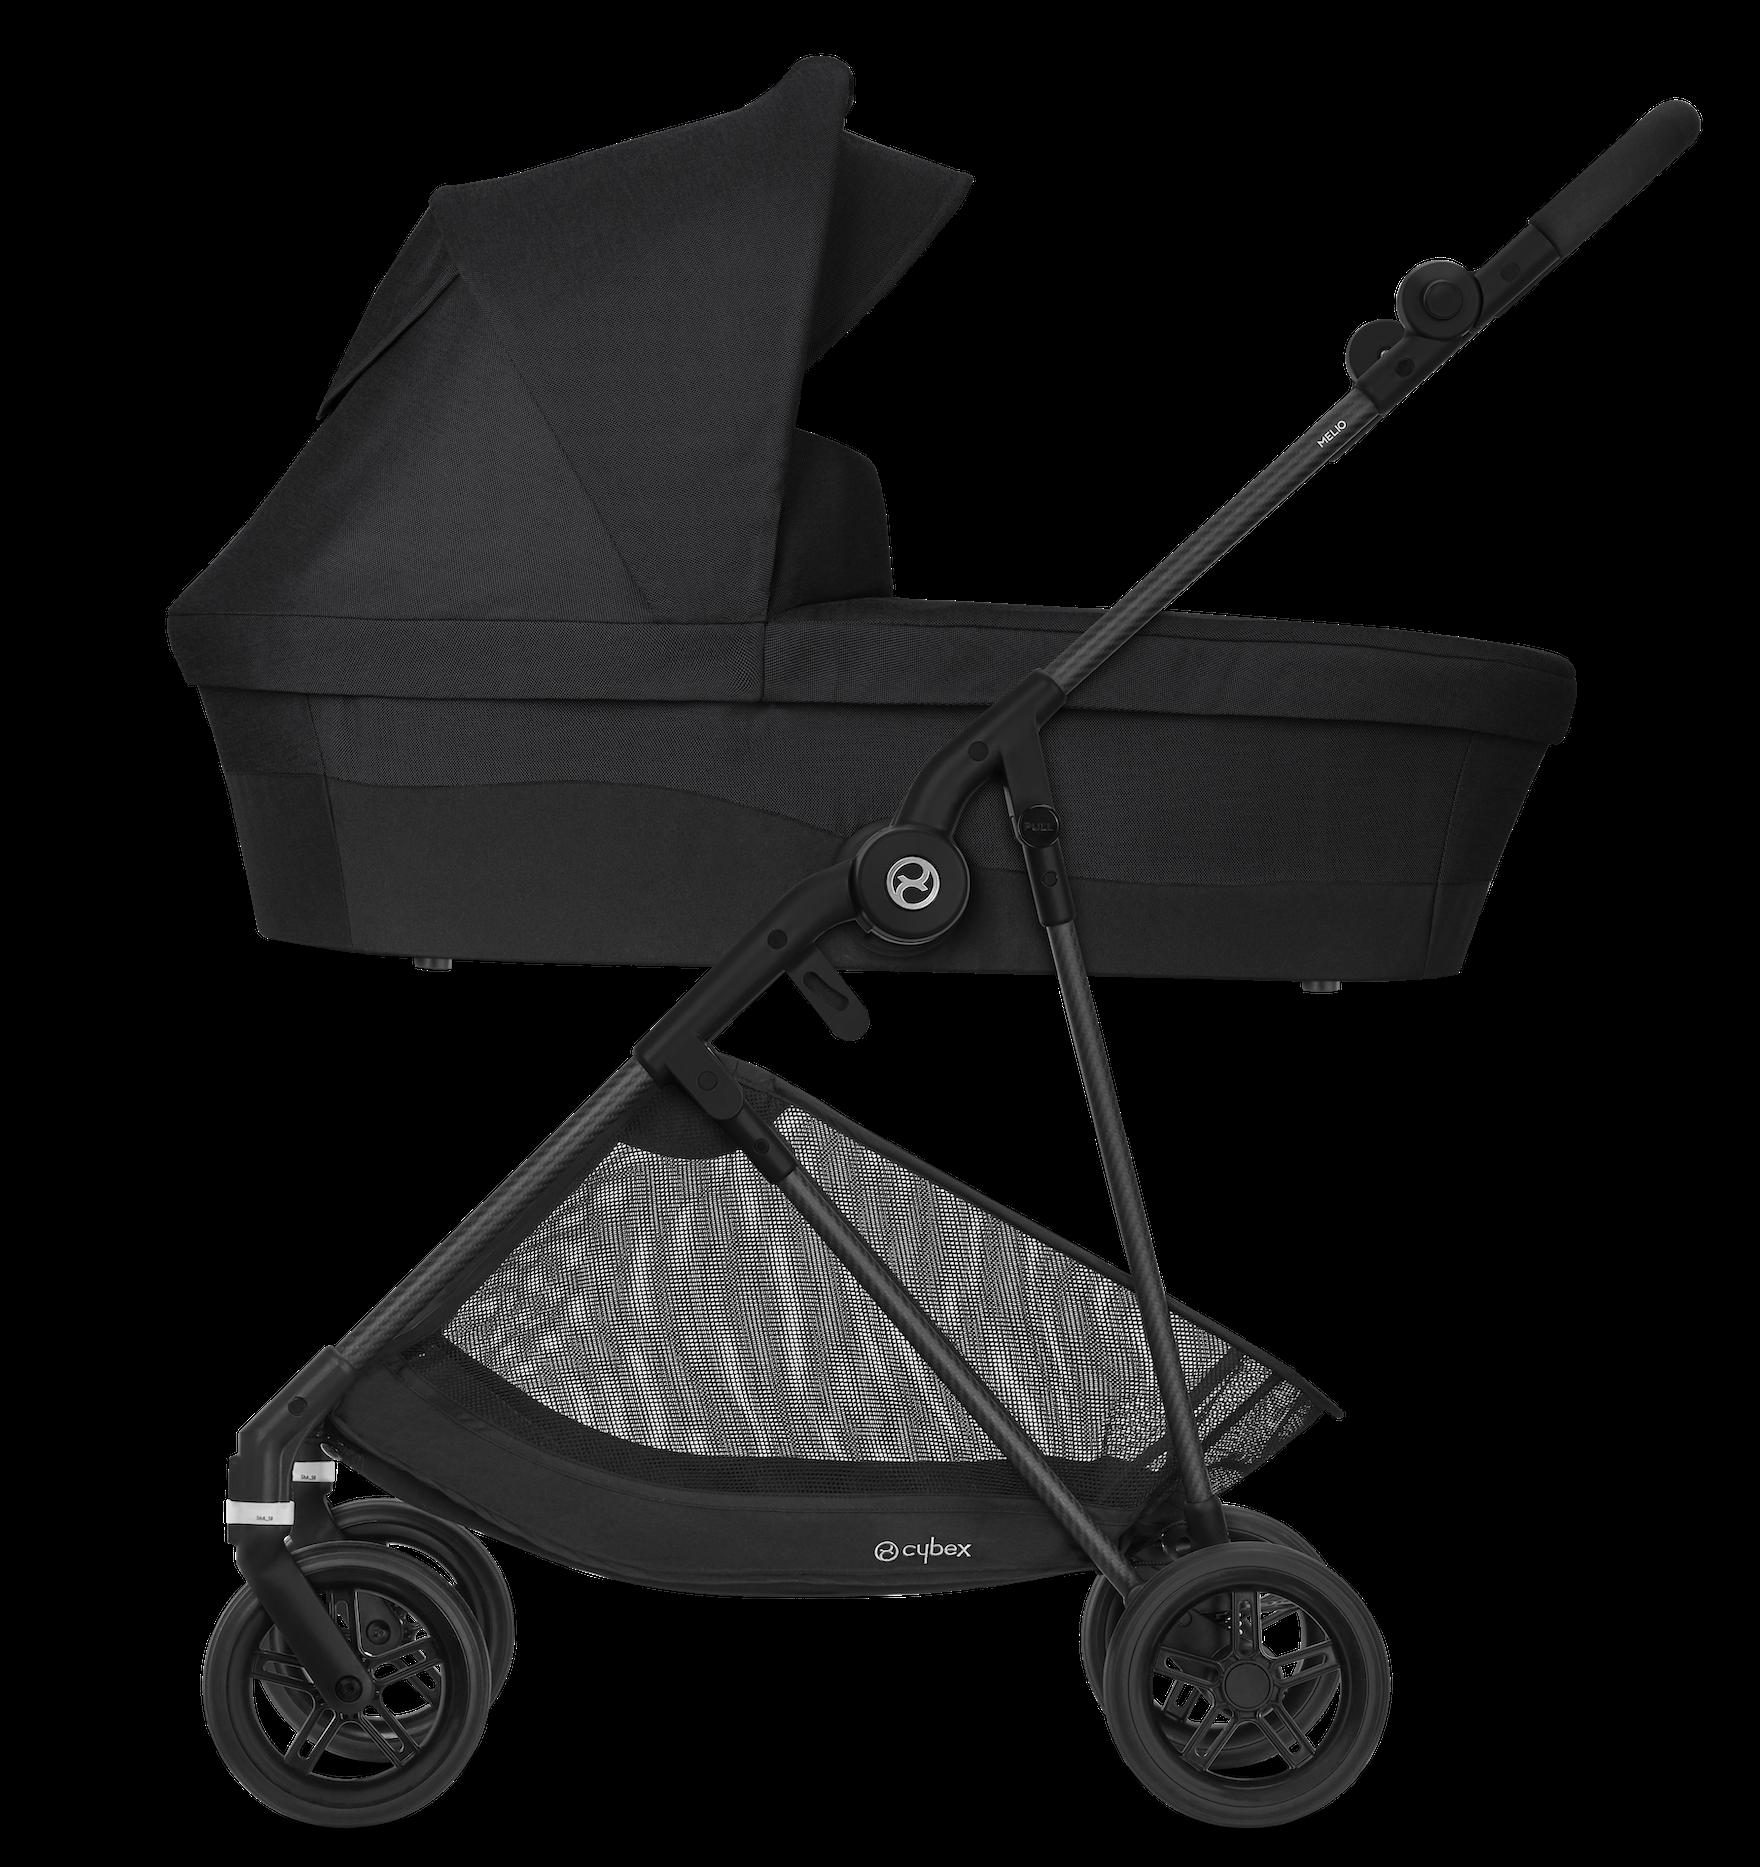 Cybex Melio Carbon stroller review - FQ Magazine